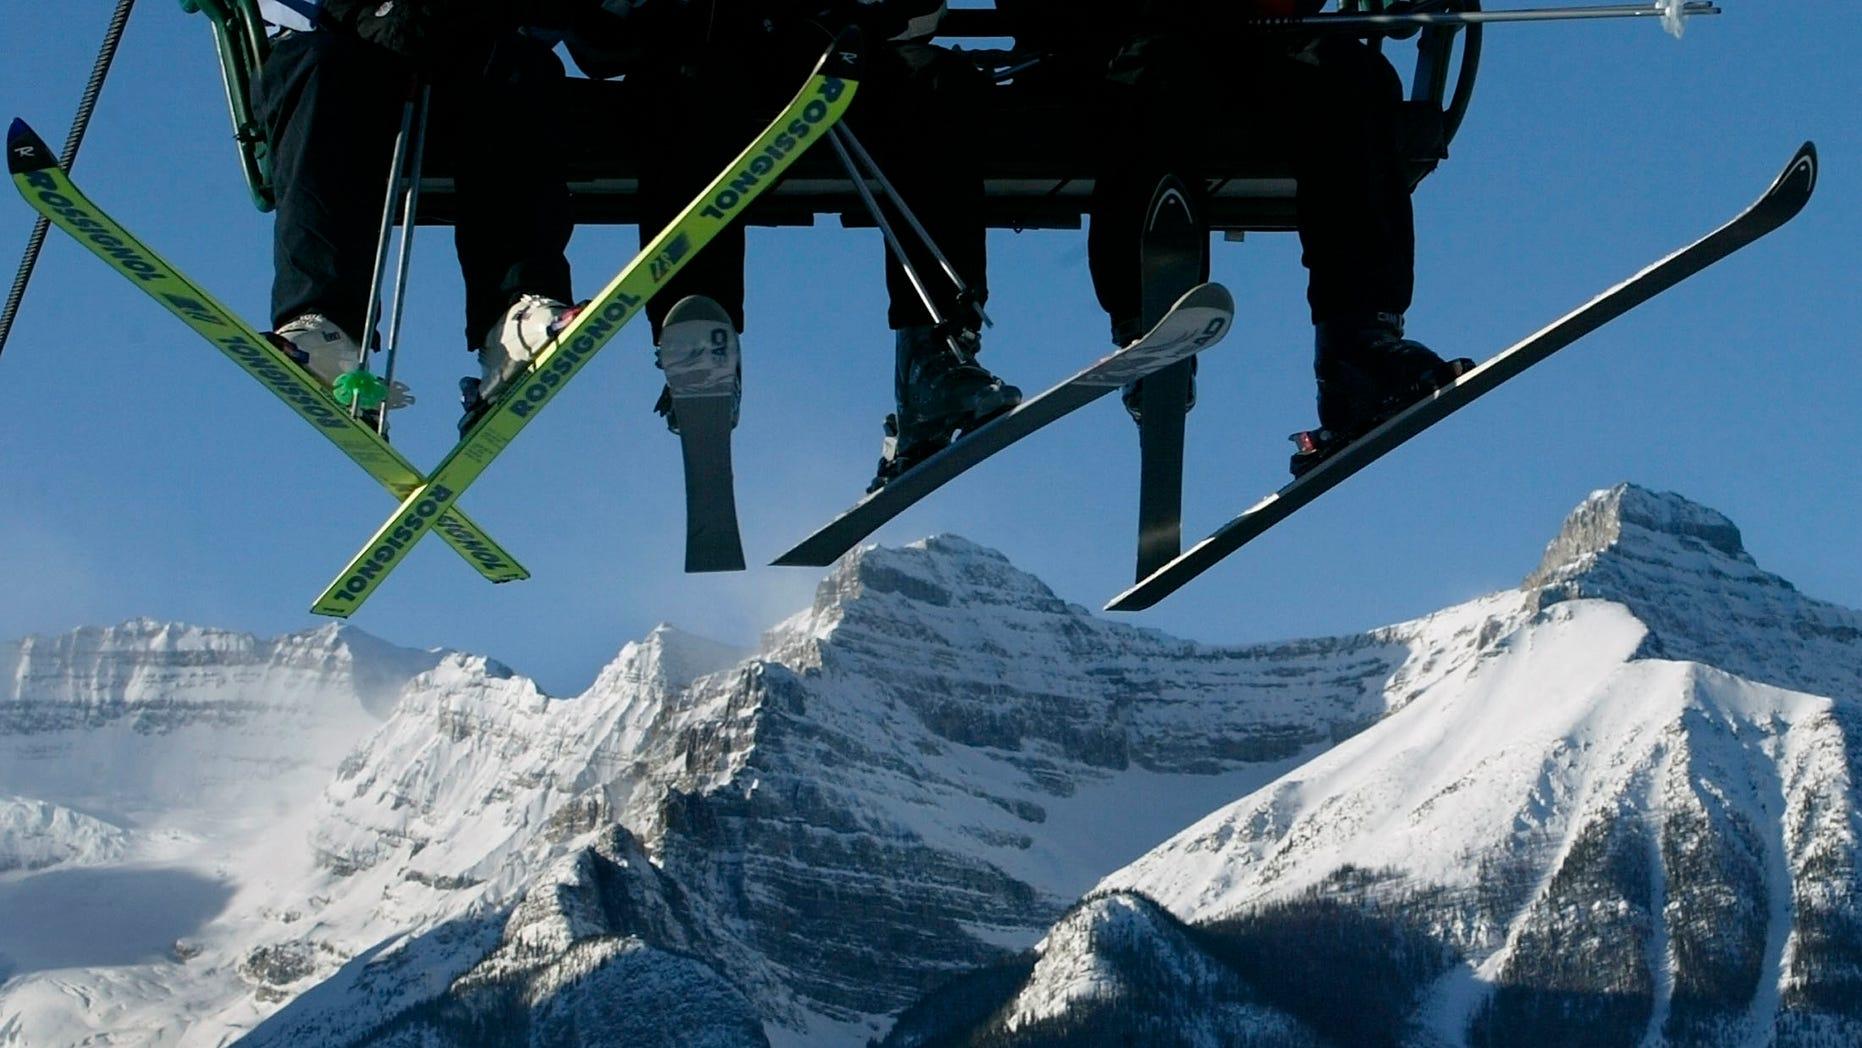 Skiers ride the lift in Lake Louise, Alberta November 30, 2003. (REUTERS/AndyClarkAC/HB)